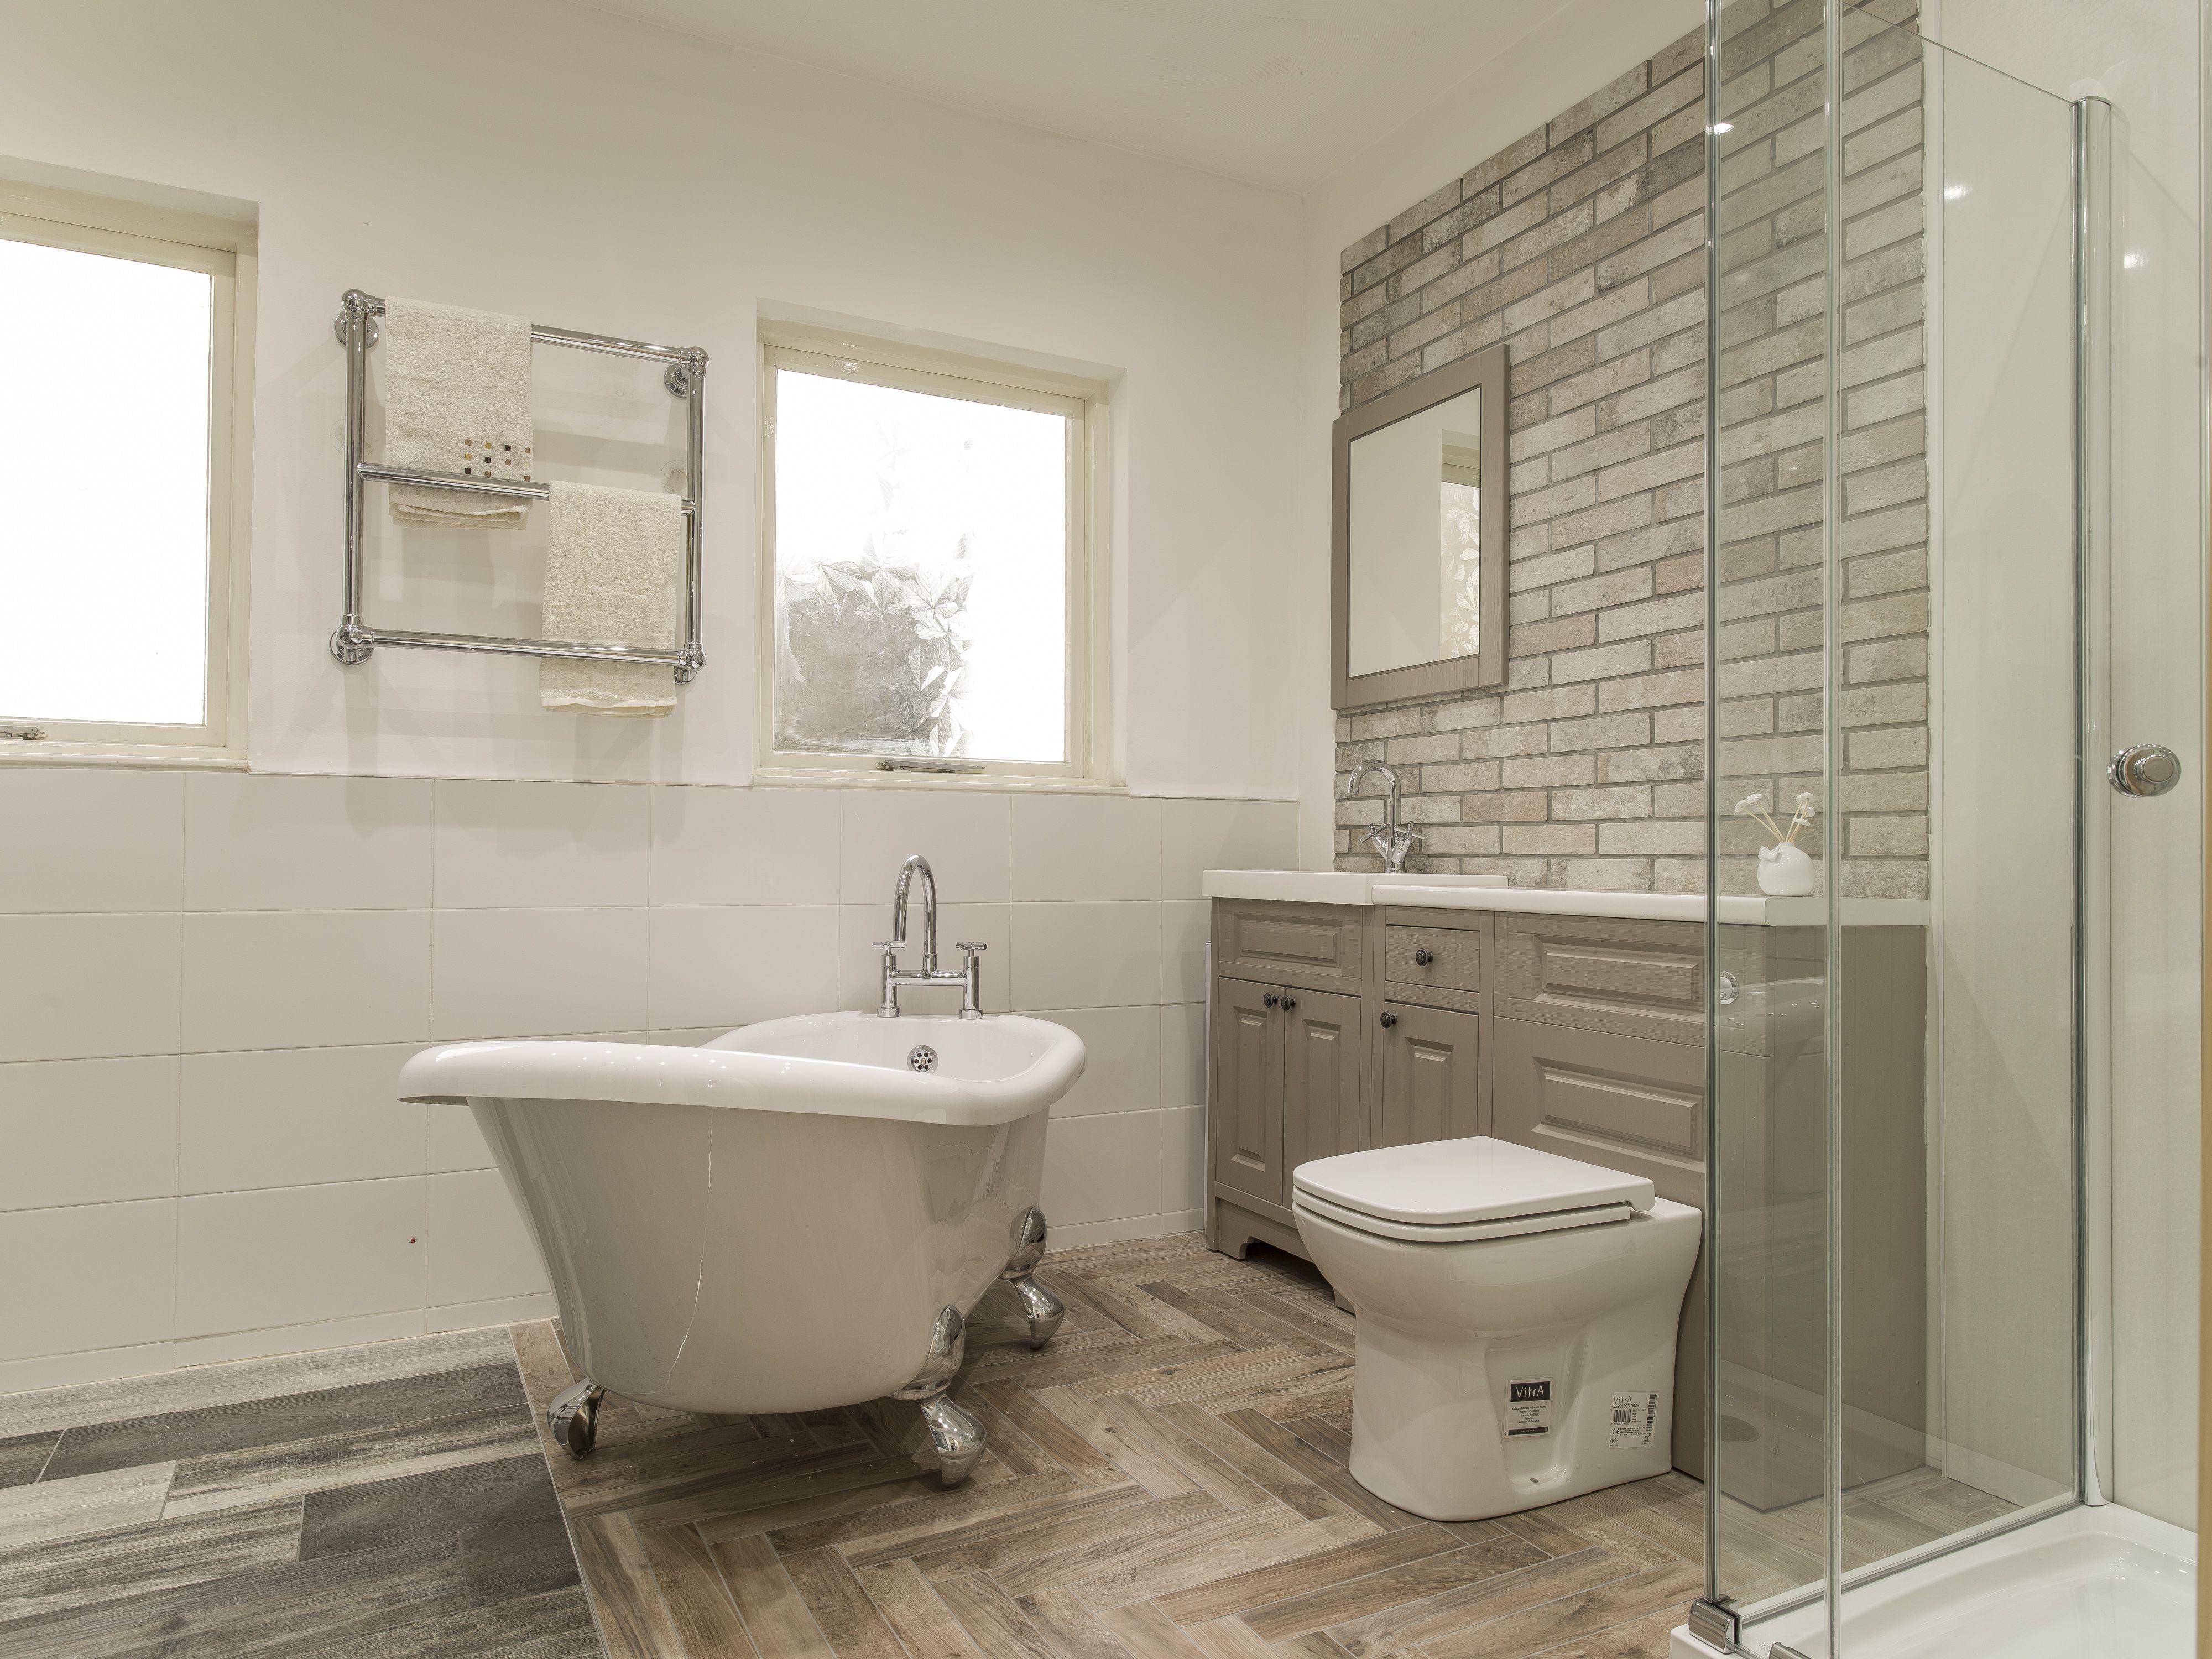 Buildbase Bathroom Showrooms Kitchen And Bath Showroom Kitchen Design Showrooms Kitchens Bathrooms